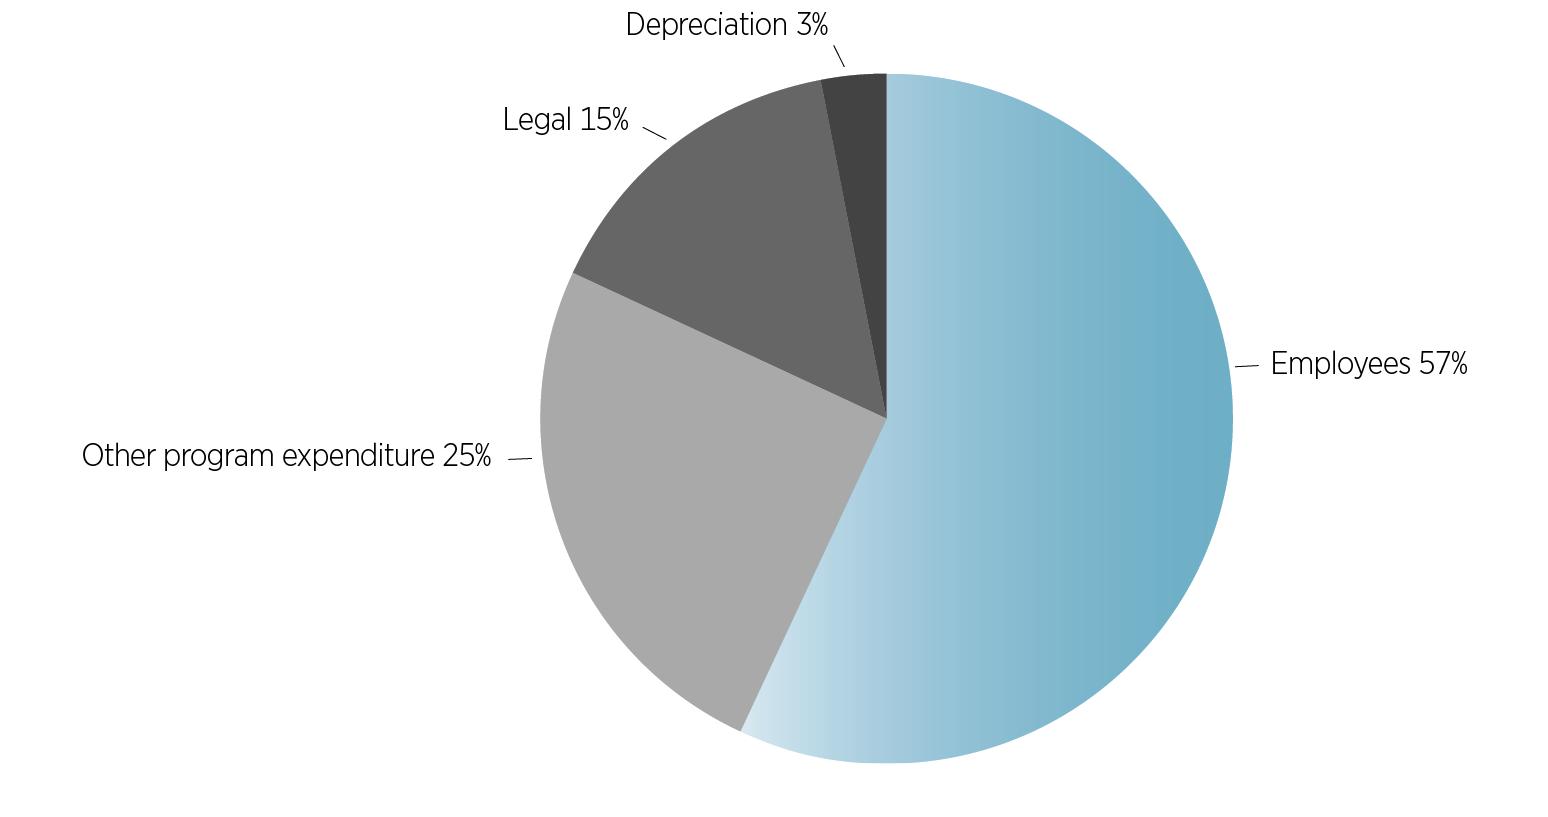 Accc Aer Annual Report 2015 16 Alfa Romeo Wiring Diagram 5 10 From 54 Votes Expenditure